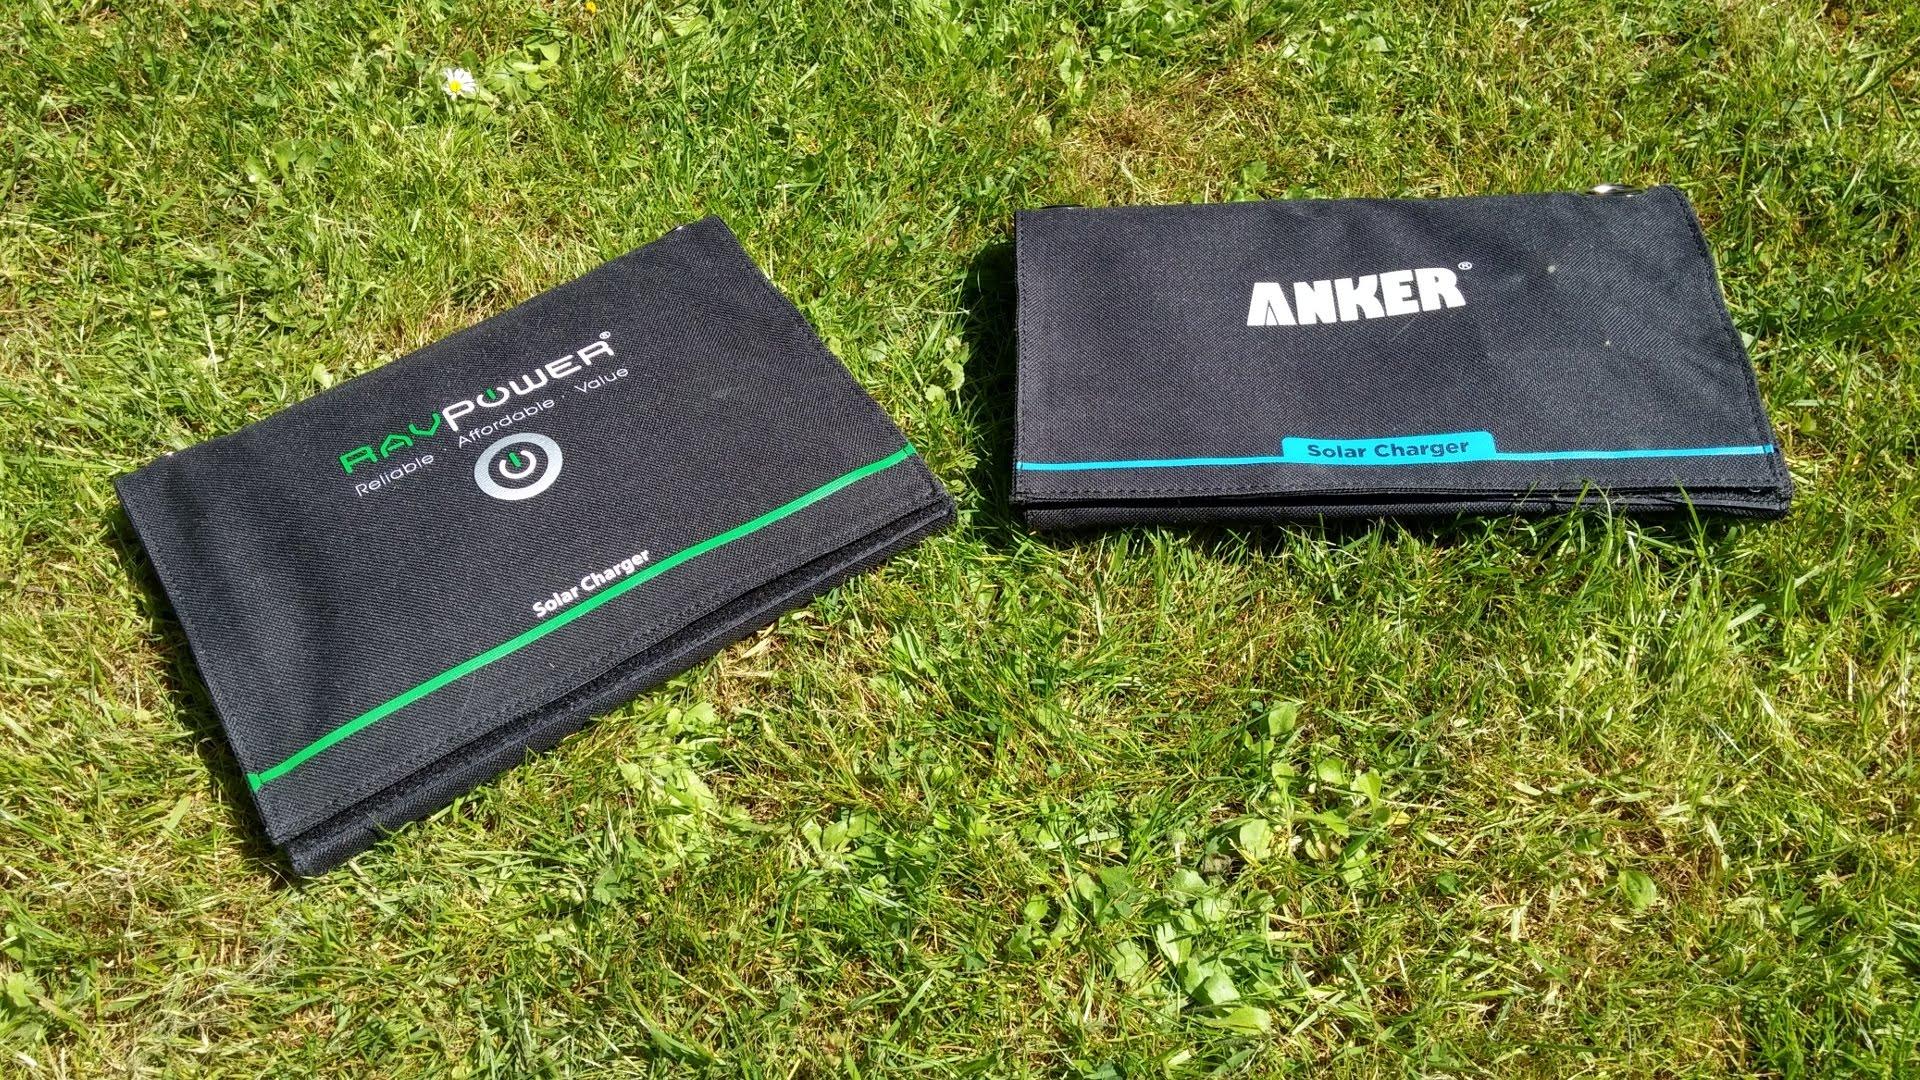 Anker 21w 2 Port Usb Powerport Solar Charger Review Slant